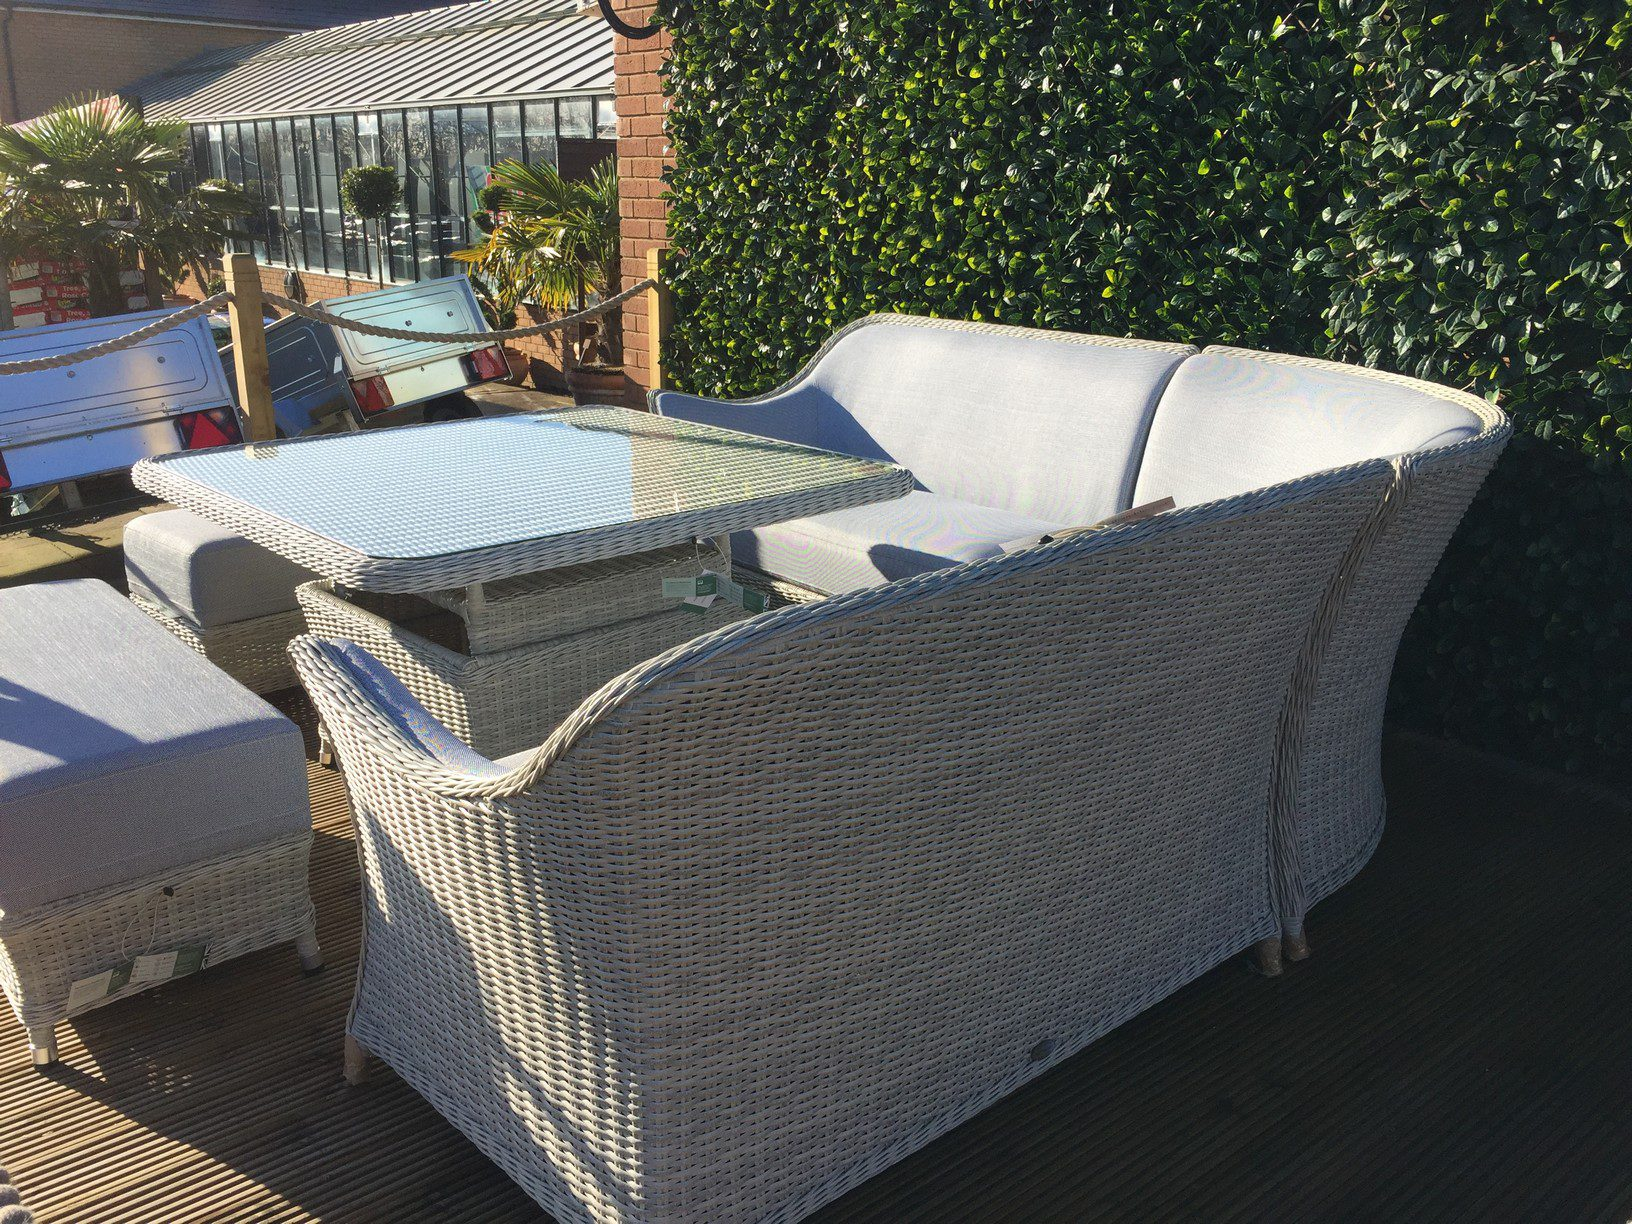 Bramblecrest Gainsborough Modular Sofa Set with Square Adjustable